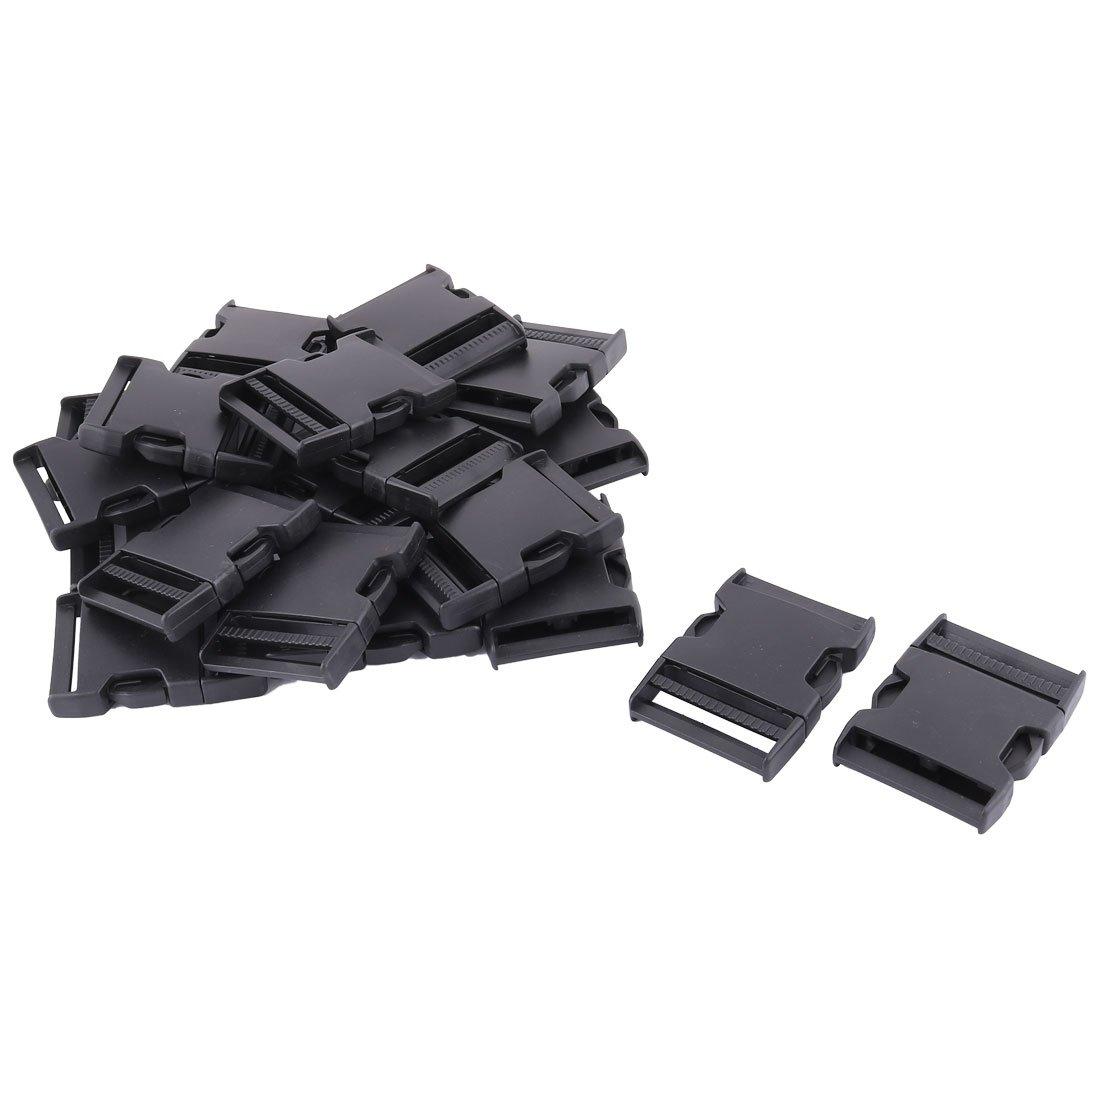 uxcell Luggage Bag Backpack Safety Strap Adjustable Side Release Buckles 3 Inch Long 20pcs Black